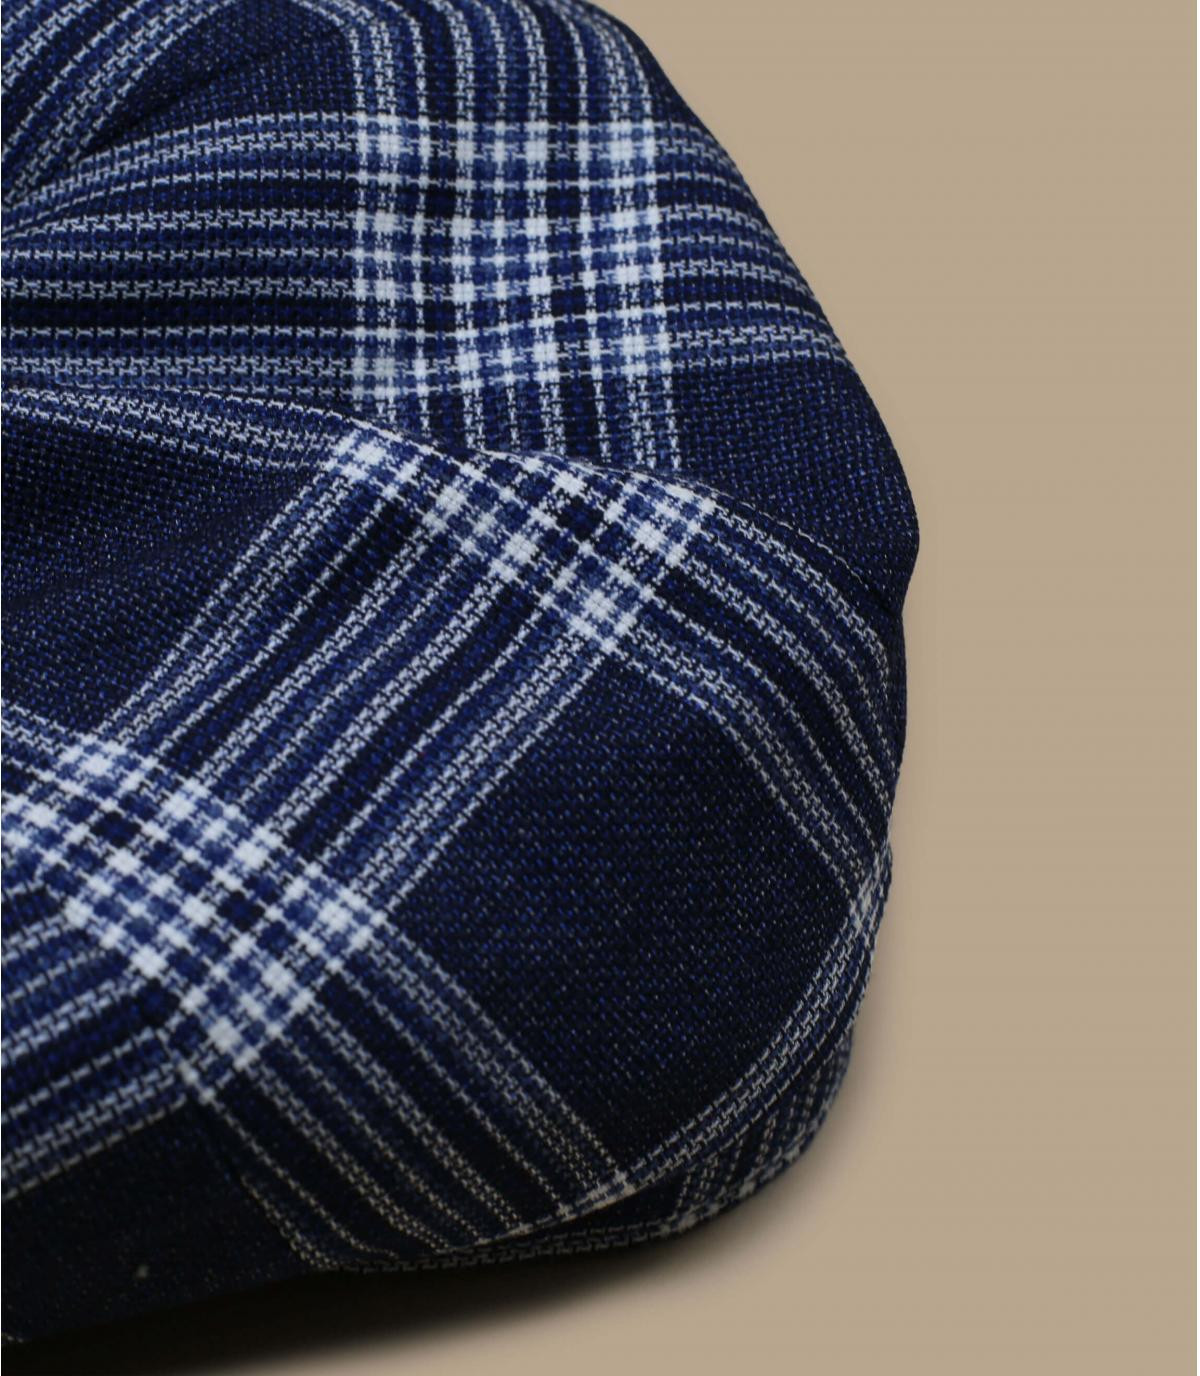 Détails Hatteras Virgin Wool blue - image 2